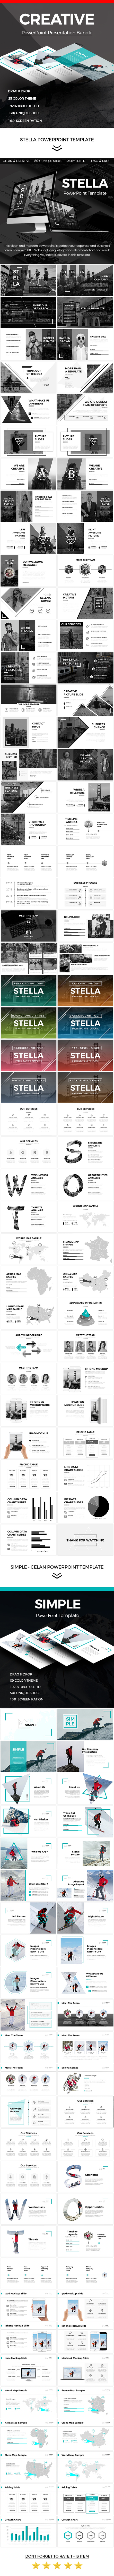 Creative Powerpoint Presentation Bundle - PowerPoint Templates Presentation Templates